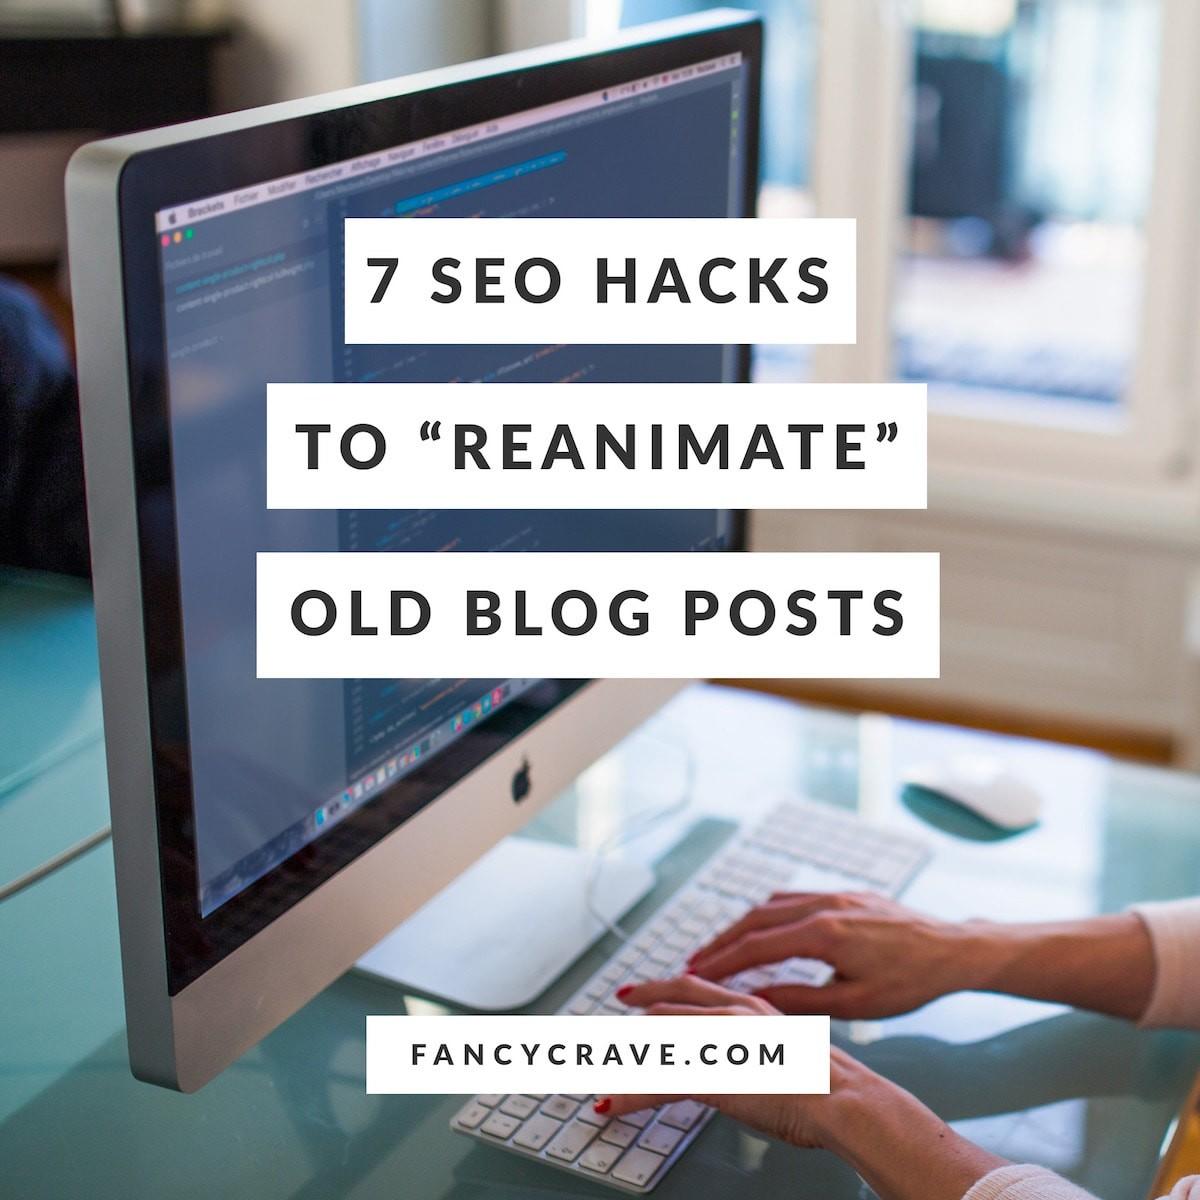 SEO Hacks to Reanimate Old Blog Posts